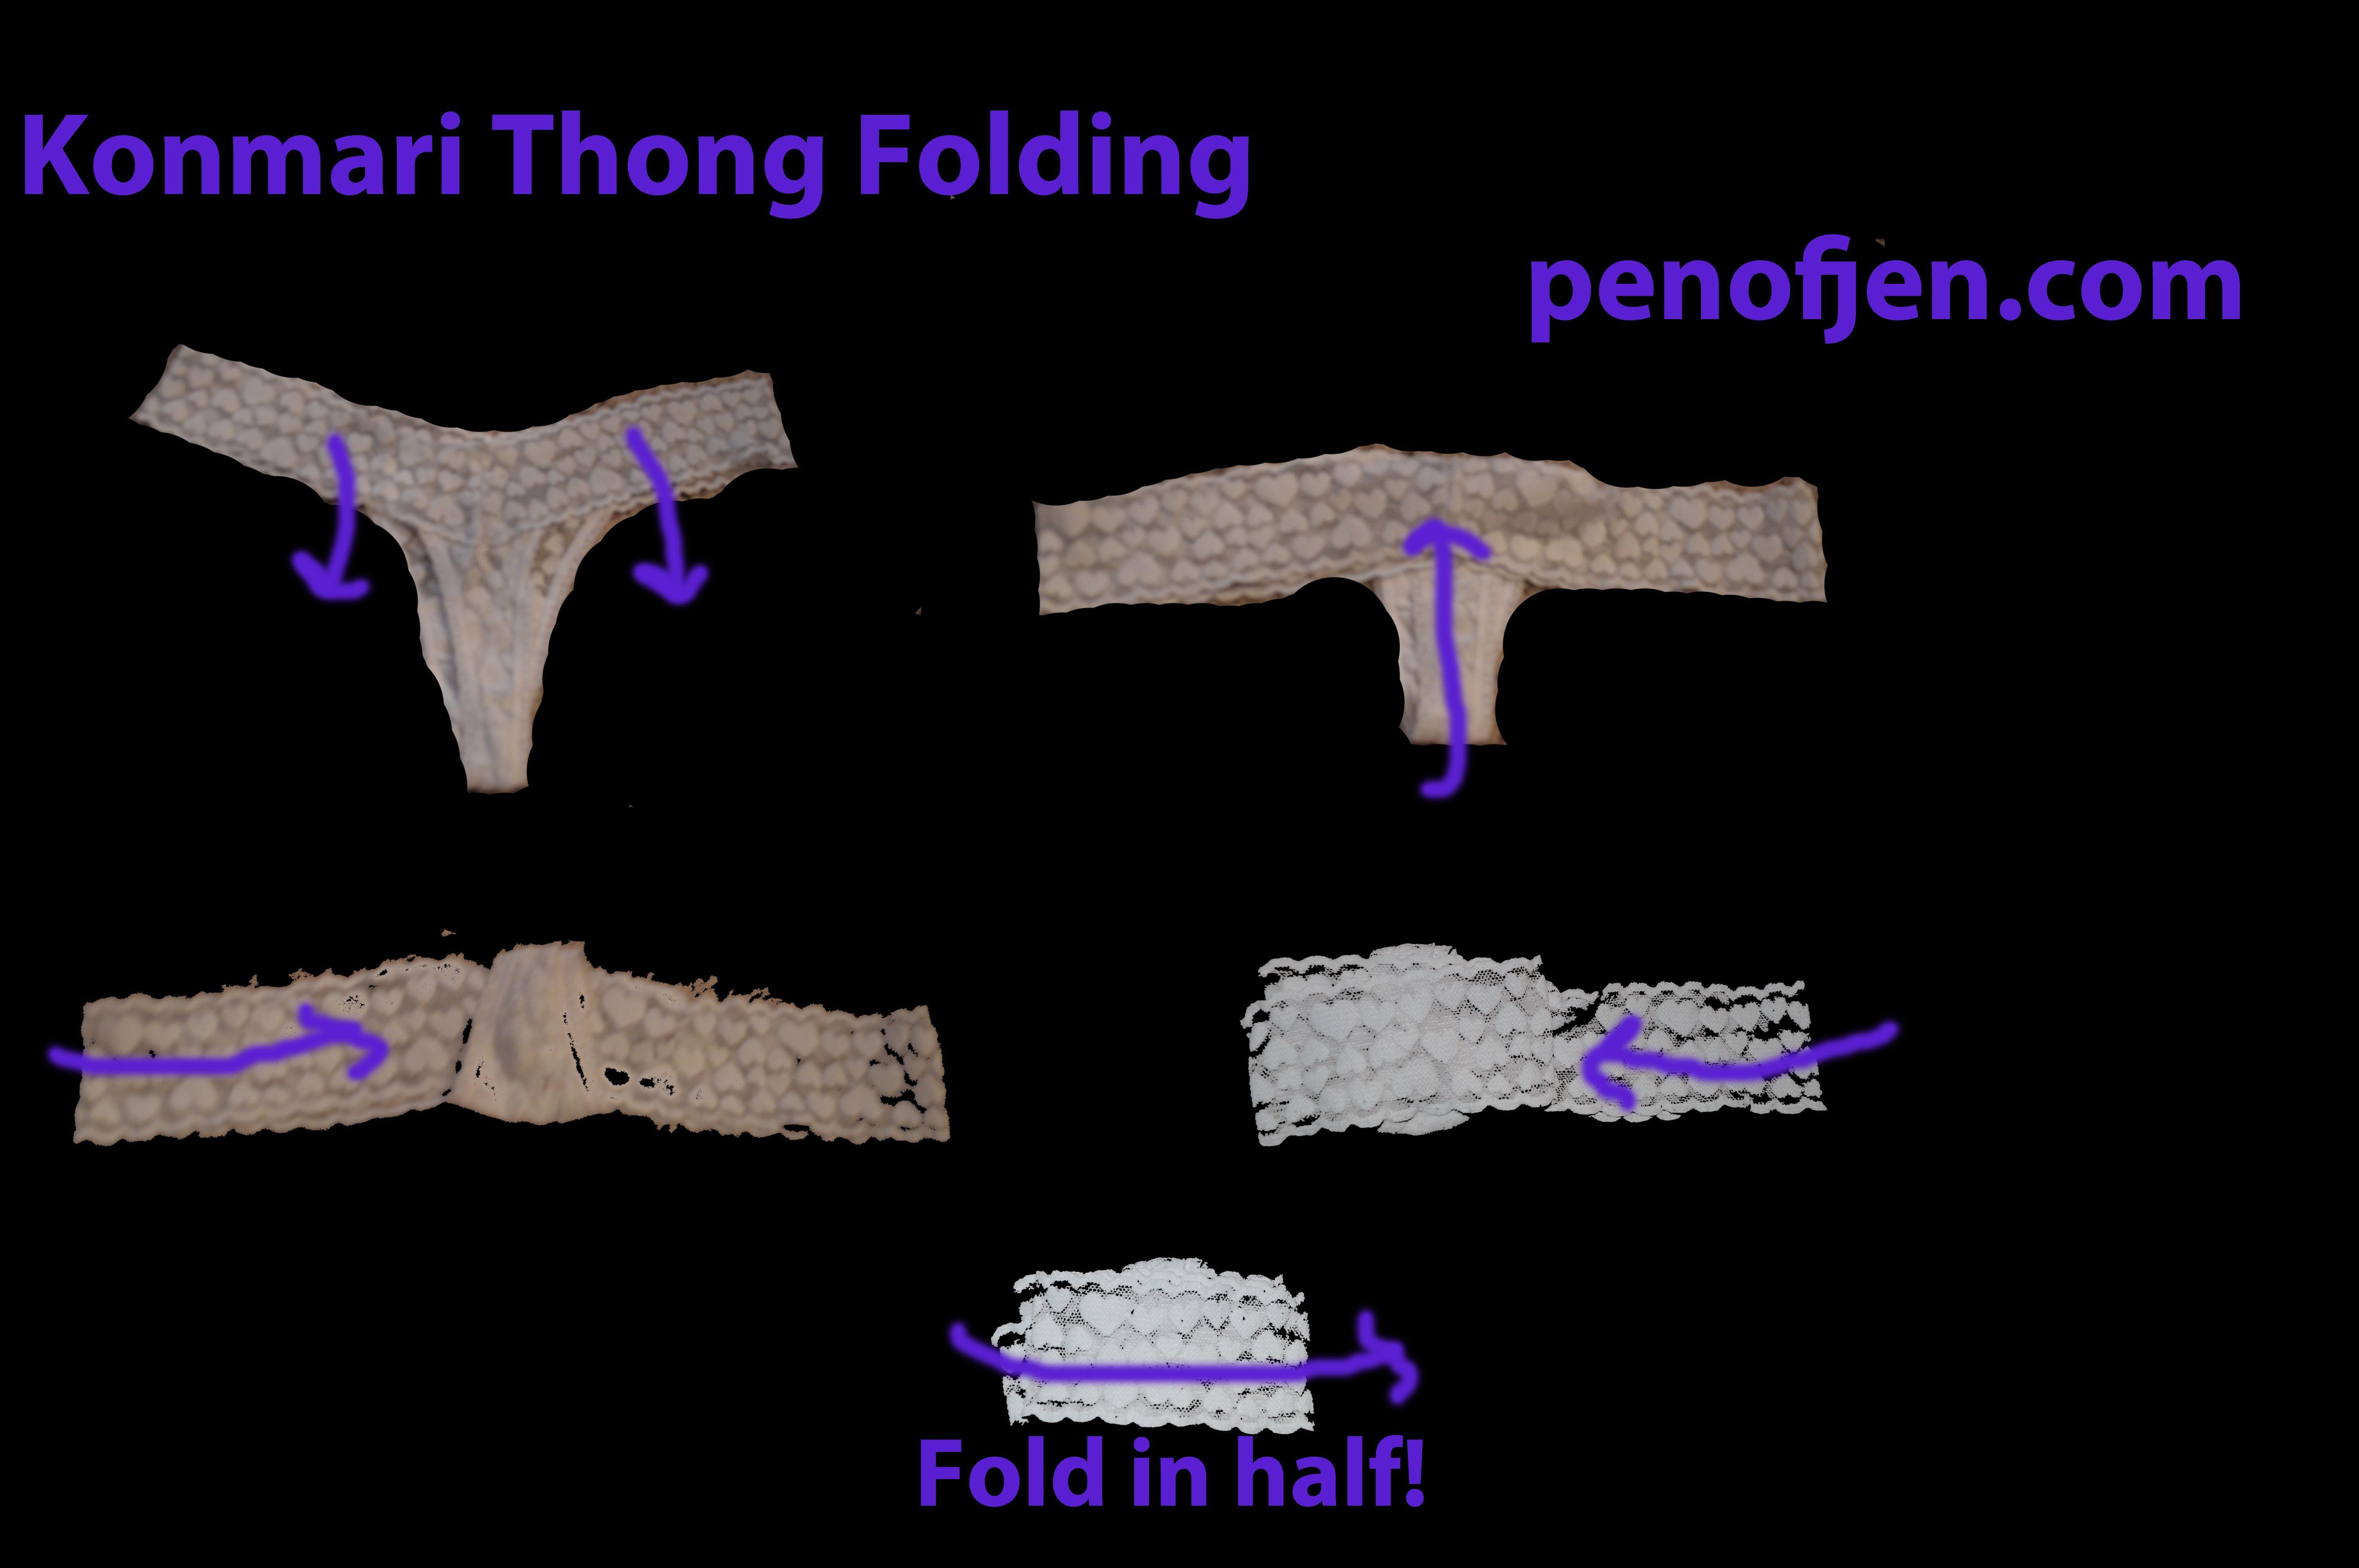 Konmari Thong Folding Kaitie Closet Fitted Sheets Diagram Organisation Organization Underwear Clothing Laundry